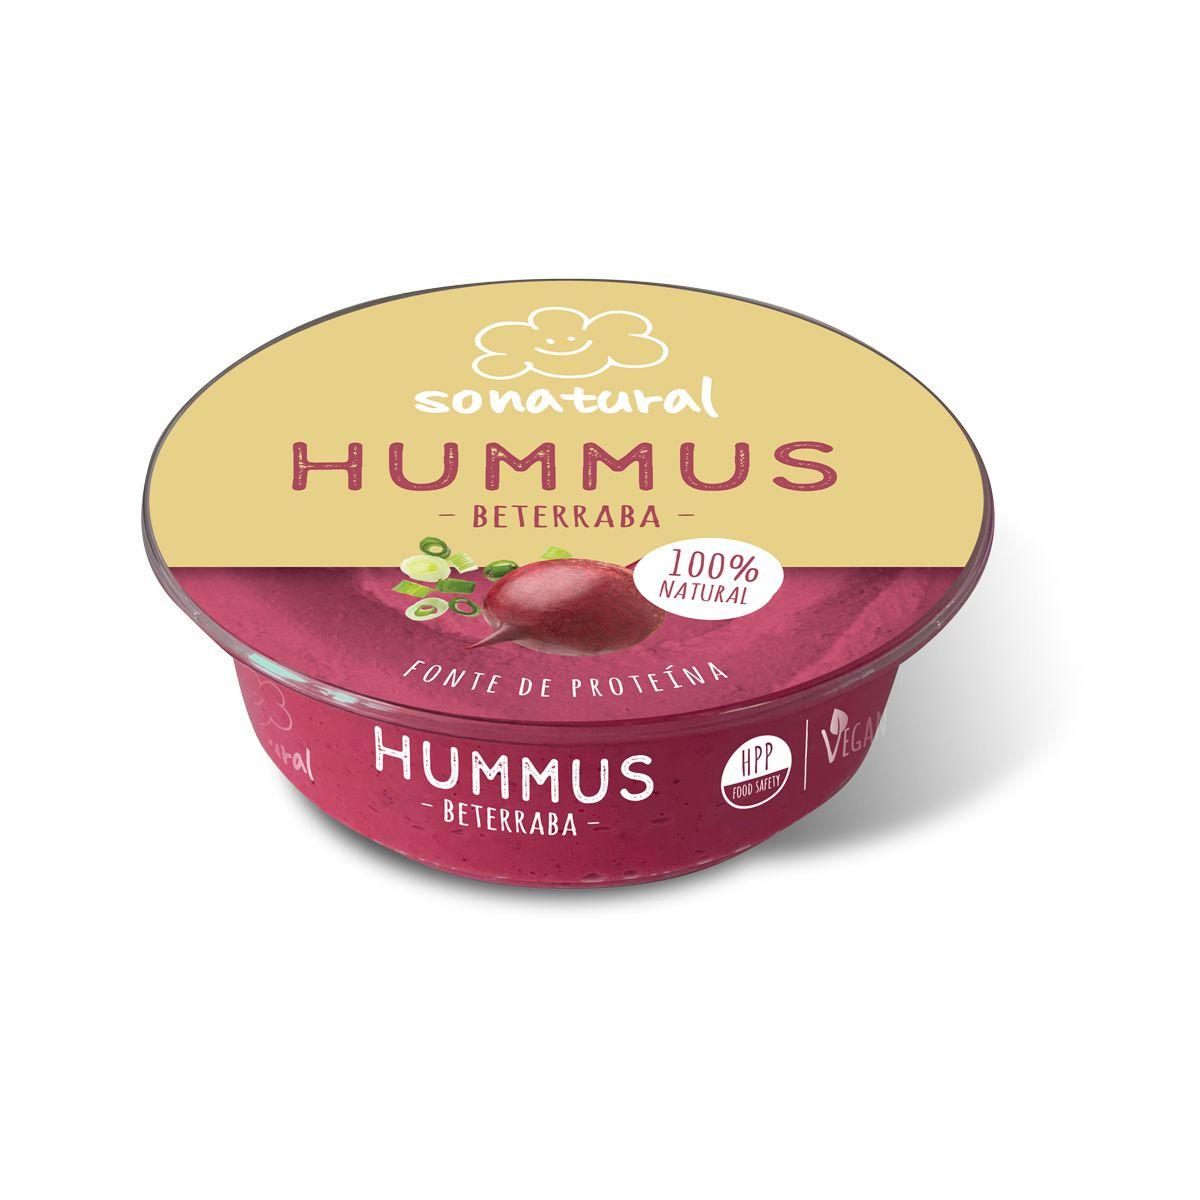 Sonatural Hummus Beterraba 200gr